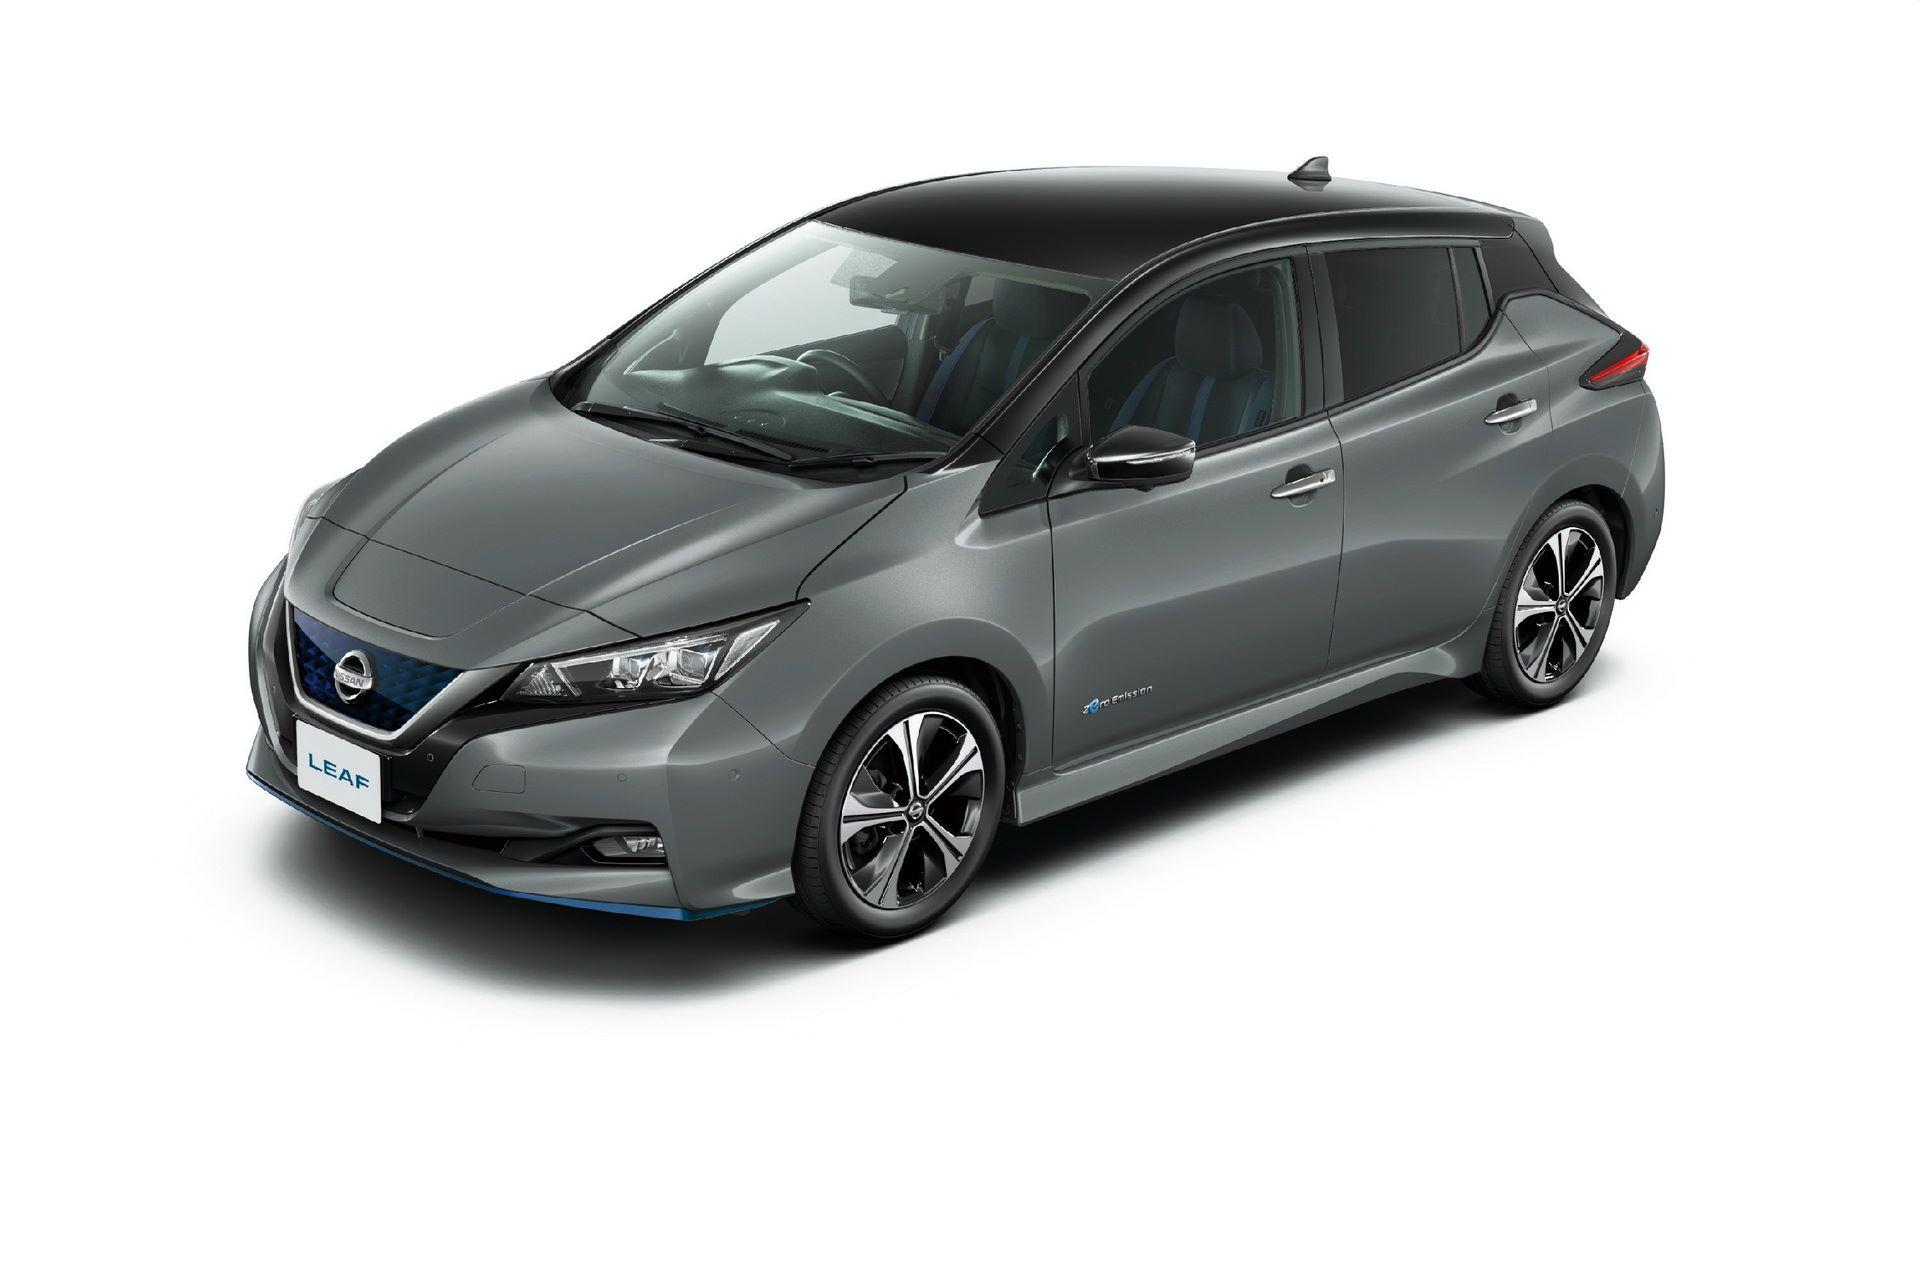 Nissan-leaf-japan-2020-6